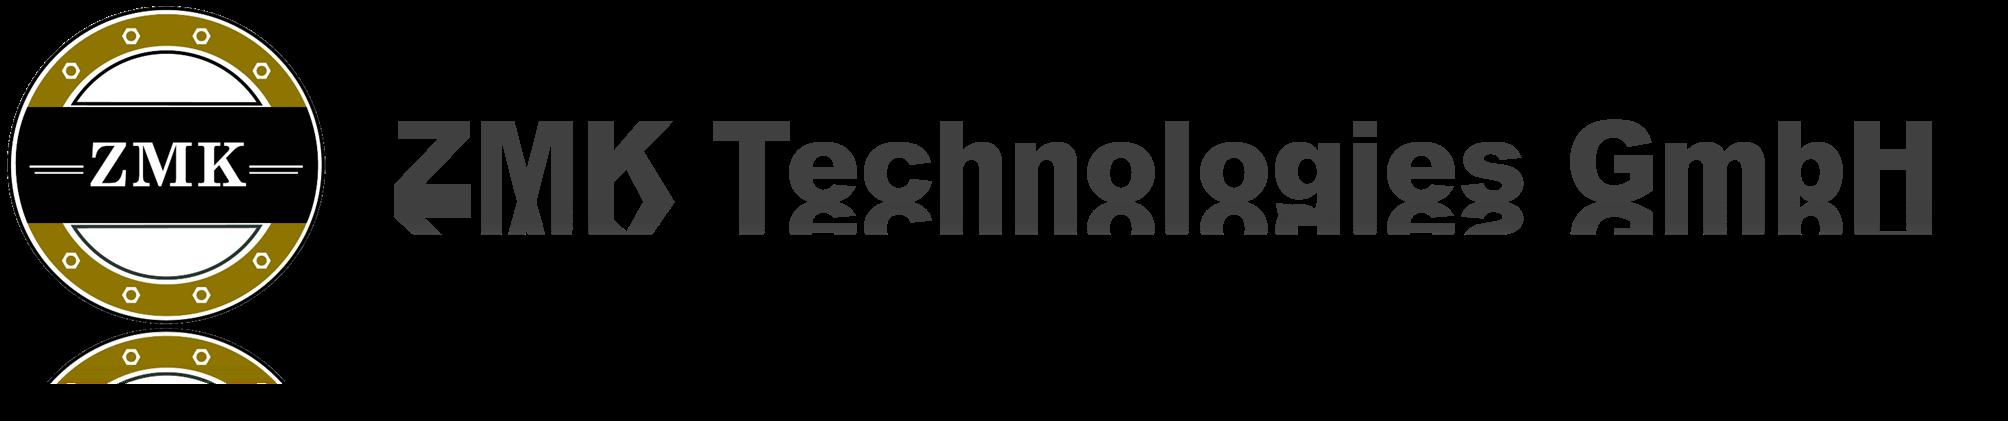 ZMK Technologies GmbH